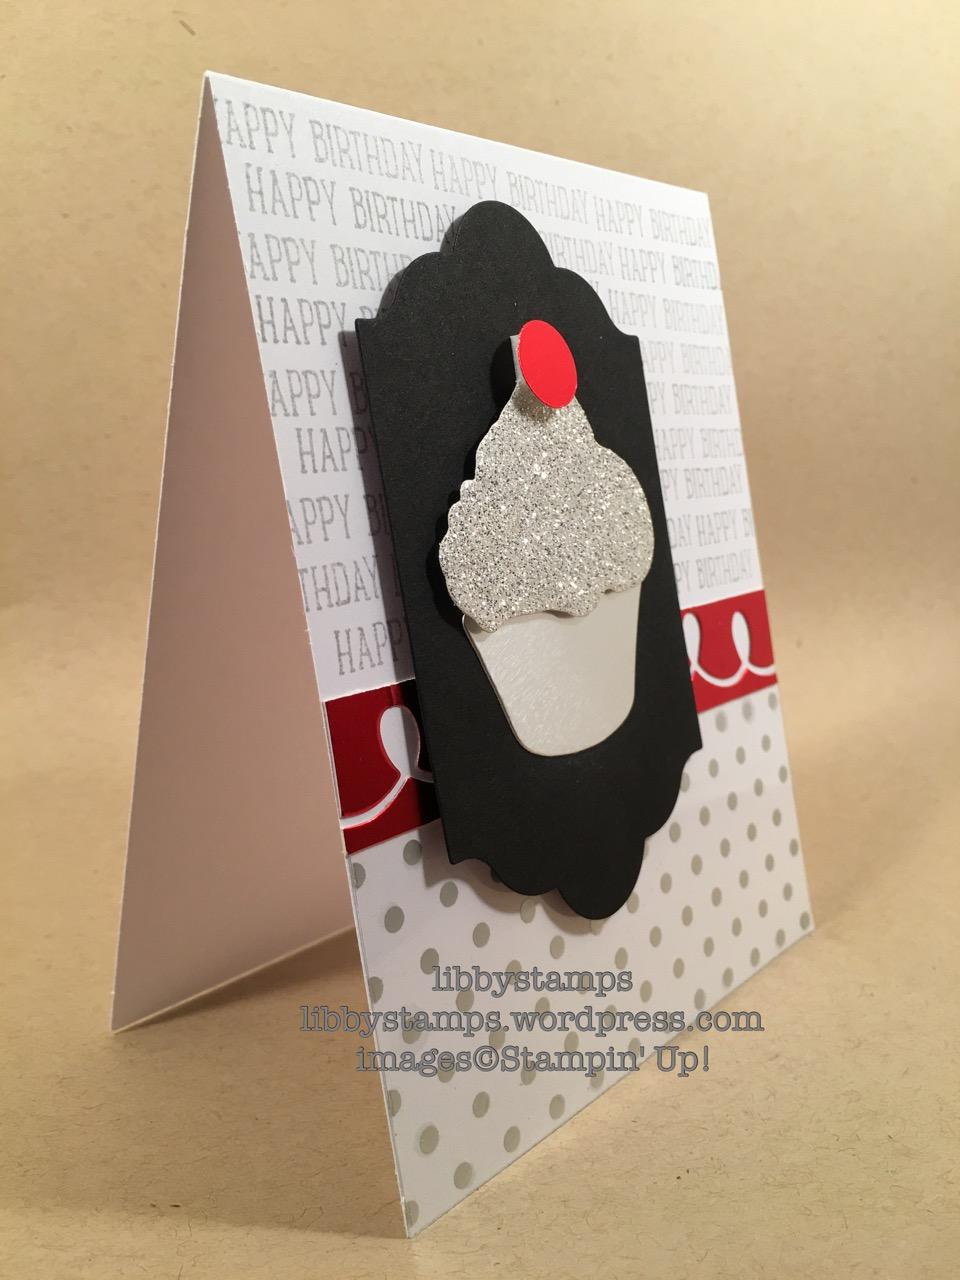 libbystamps, stampin up, Sweet Cupcake, Cupcake Cutouts Framelits, Lots of Labels Framelits, Fabulous Foil Designer Acetate, Silver Foil, Silver Glimmer Paper, Red Foil Sheets